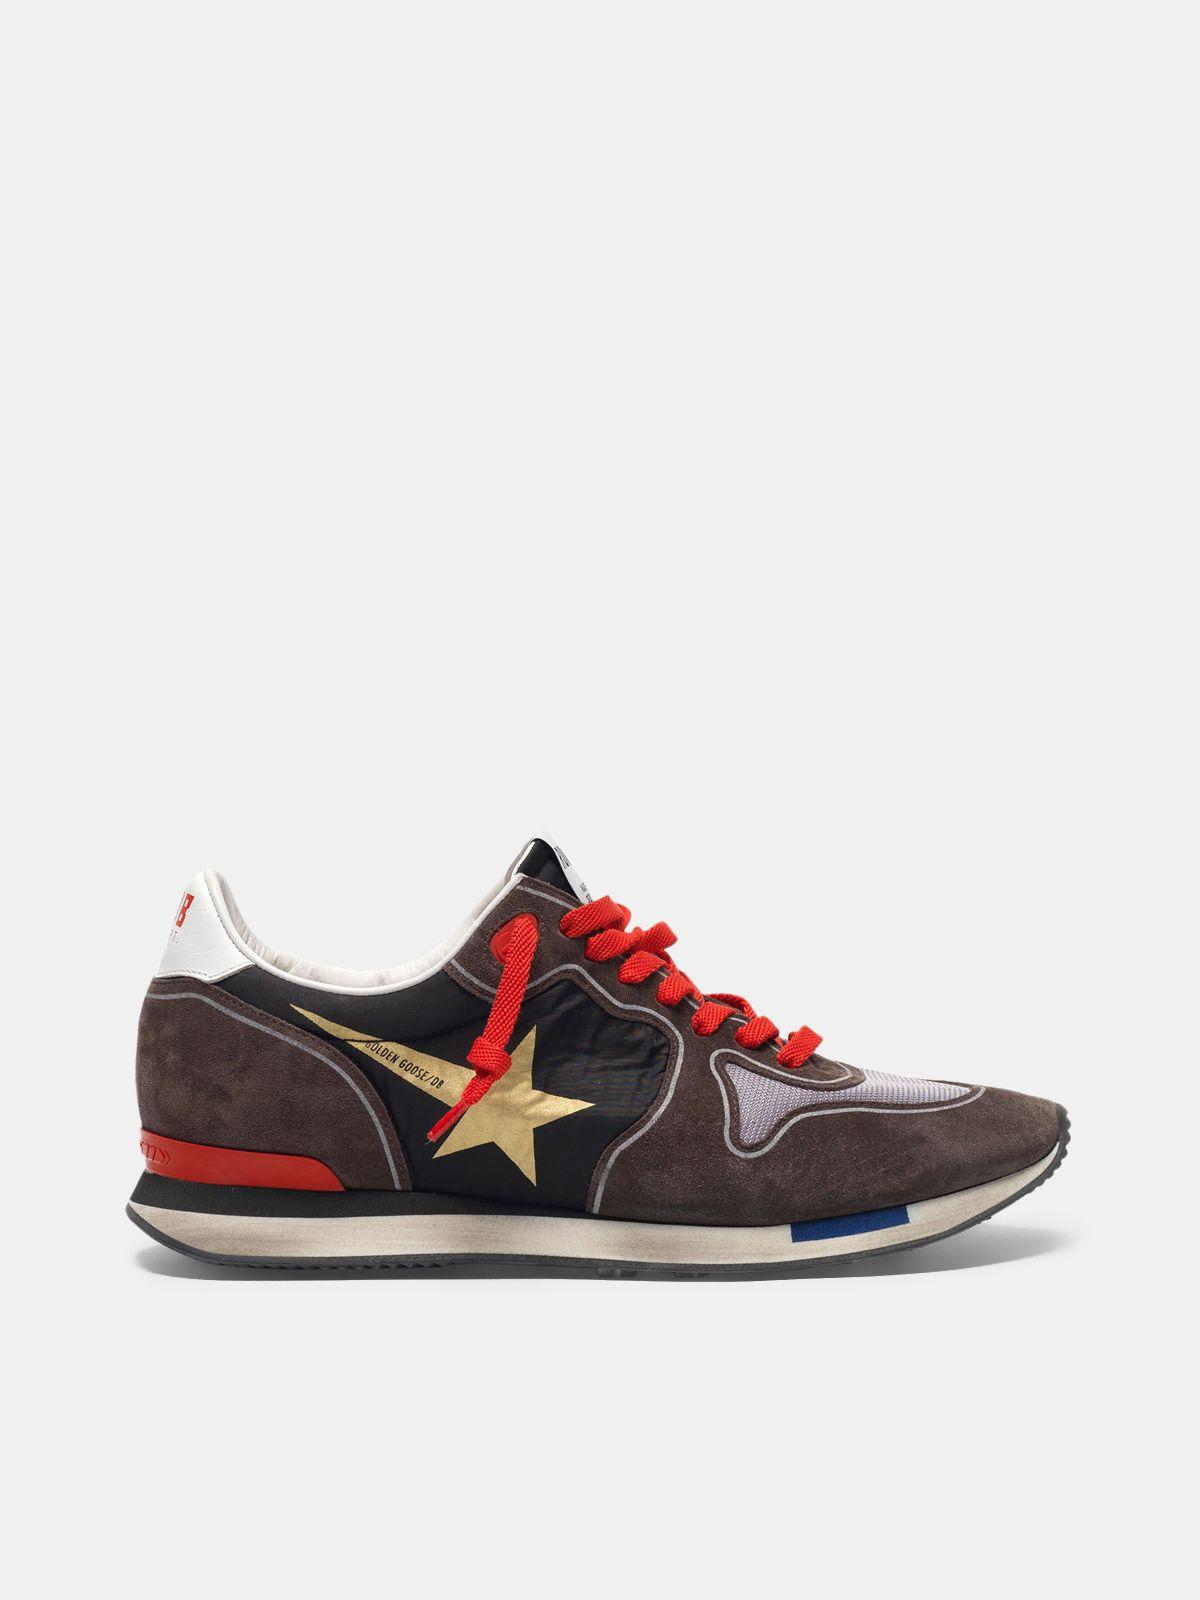 Golden Goose - Sneakers running in suede con inserto mesh e nylon in